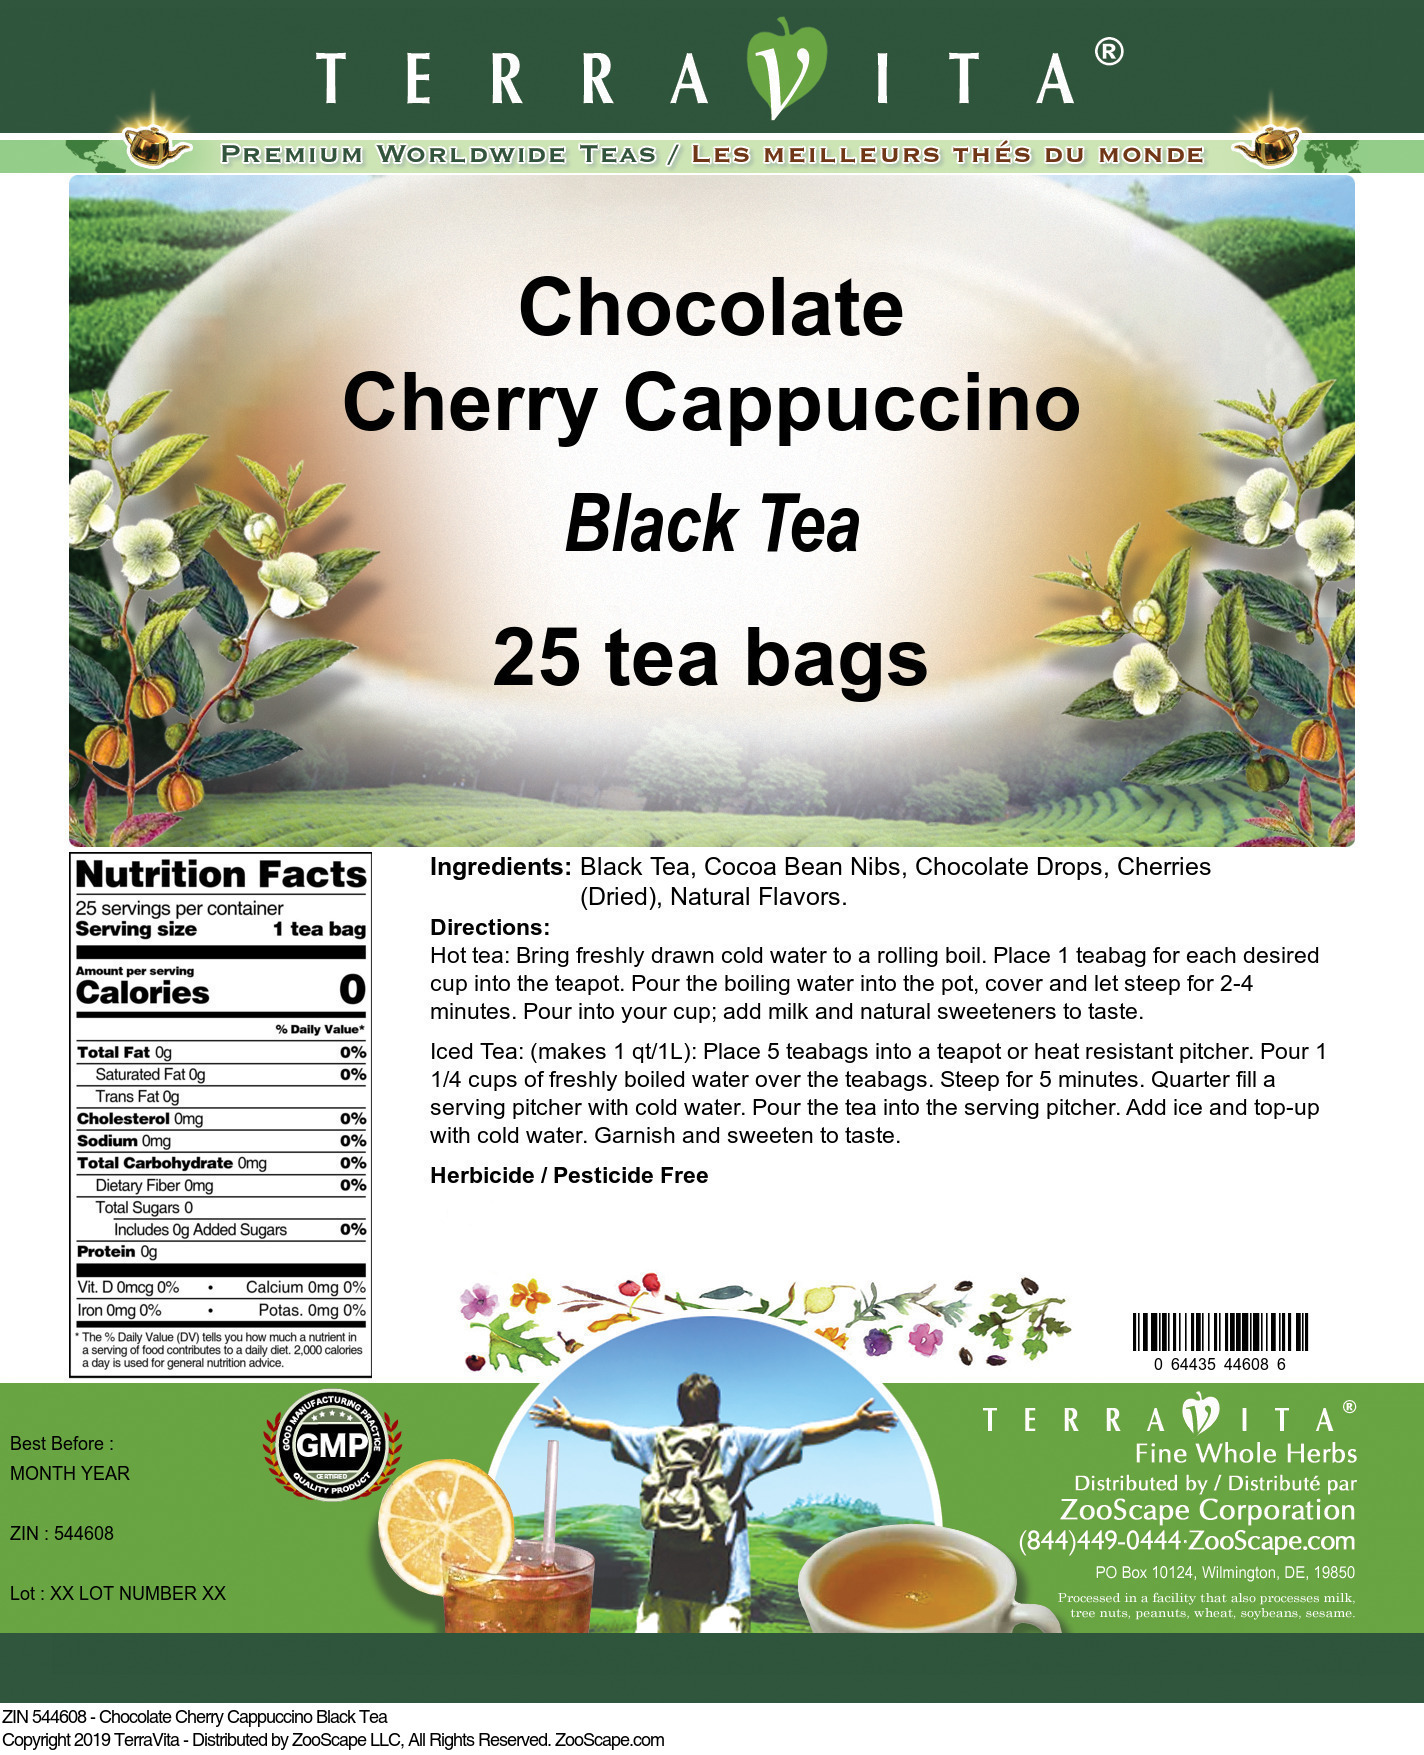 Chocolate Cherry Cappuccino Black Tea